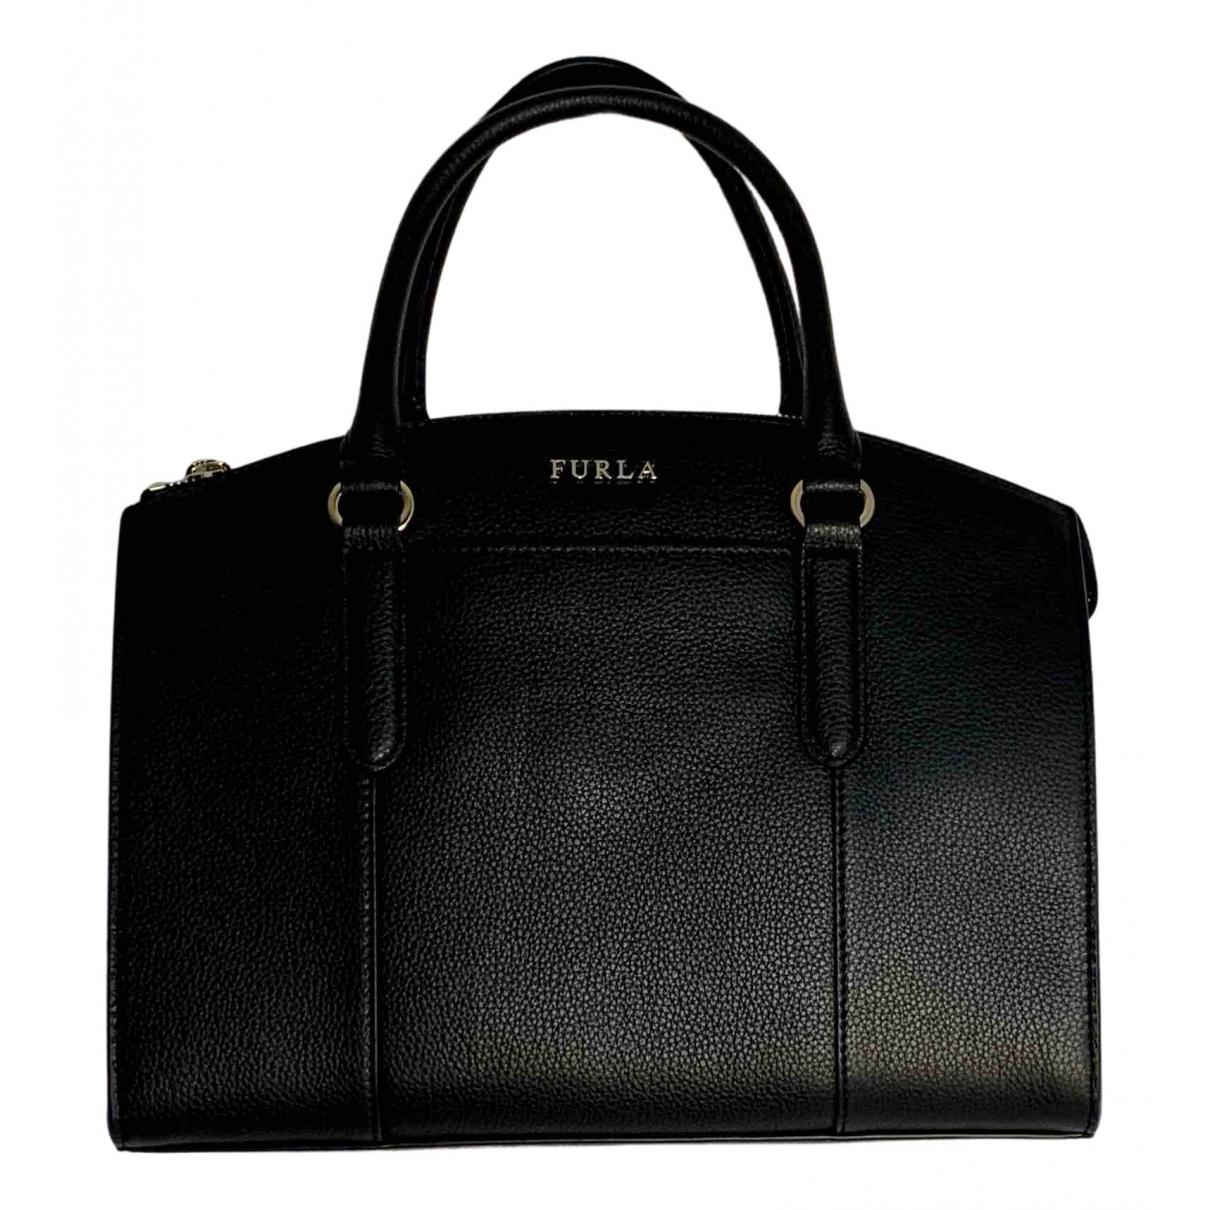 Furla N Beige Leather handbag for Women N